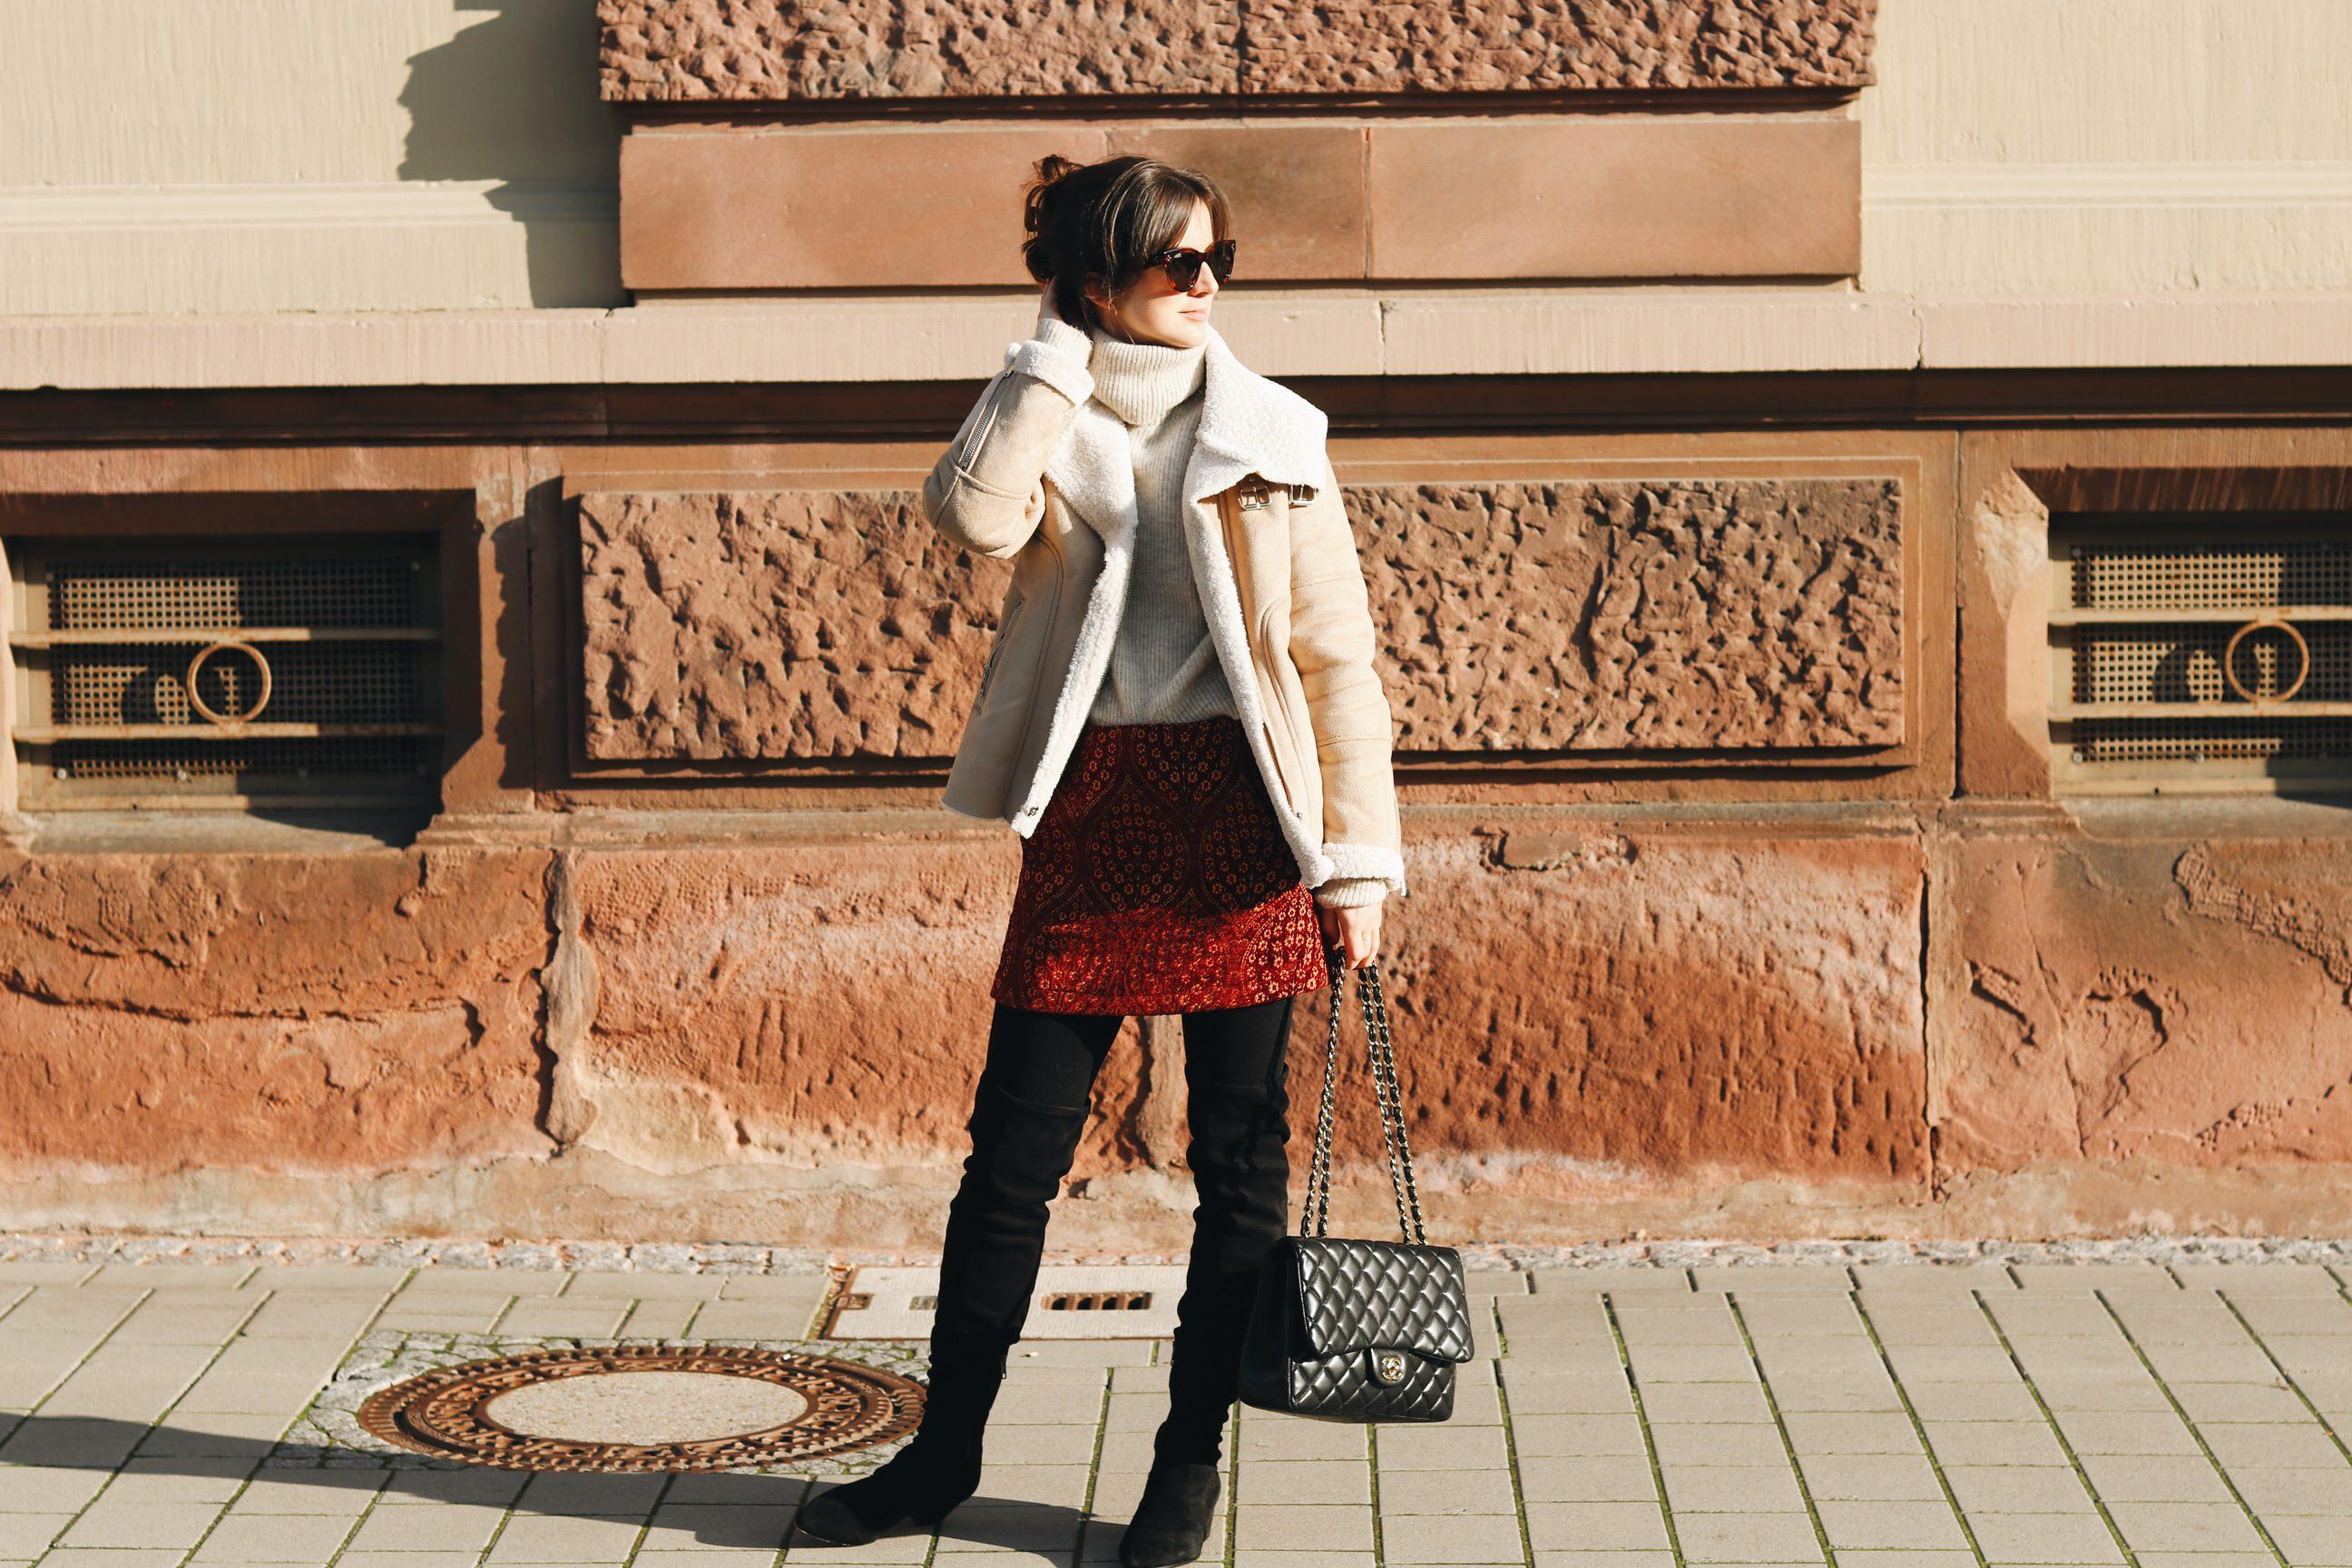 Modeblog Outfit Streetstyle Fashion deutsch Bloggerin Winter Look Lammfelljacke Minirock Chanel Tasche Celine Sonnenbrille